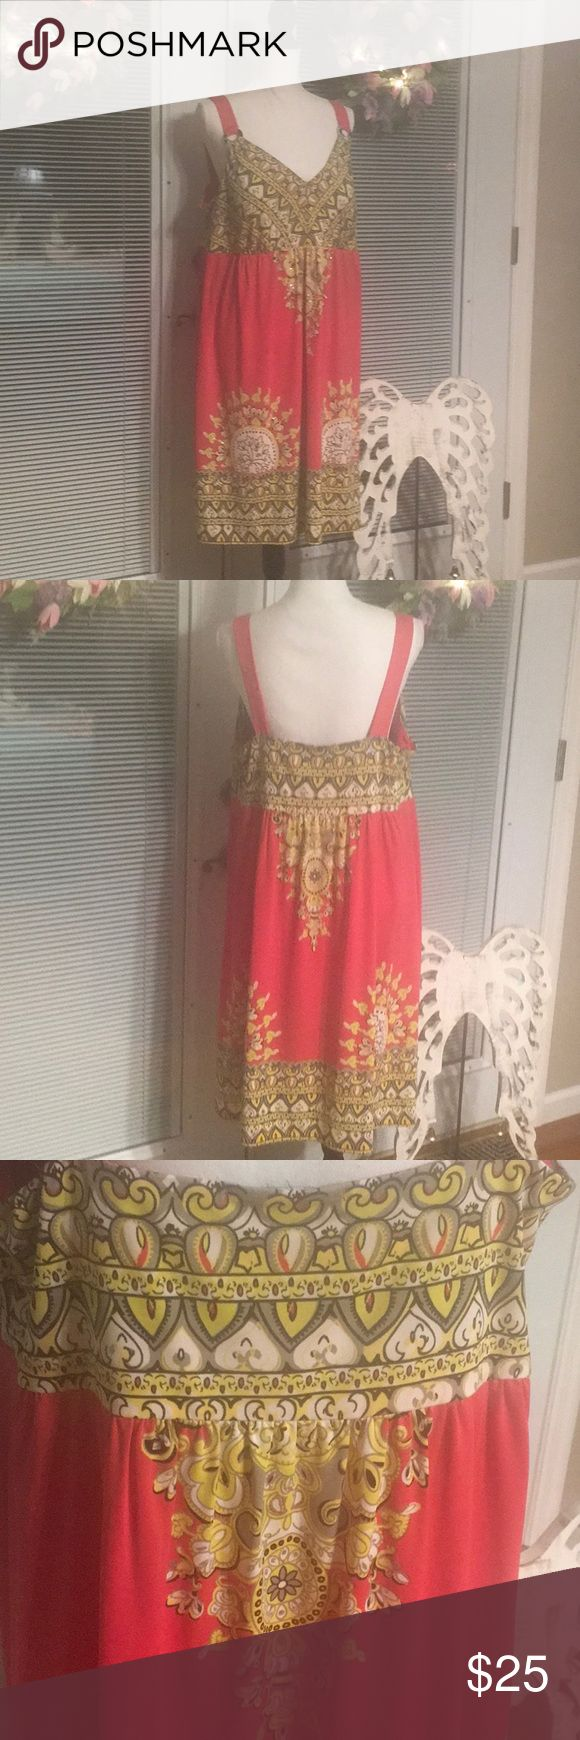 INC Dress 👗The color is more of a peach orange. 2X INC Dress INC International Concepts Dresses Midi